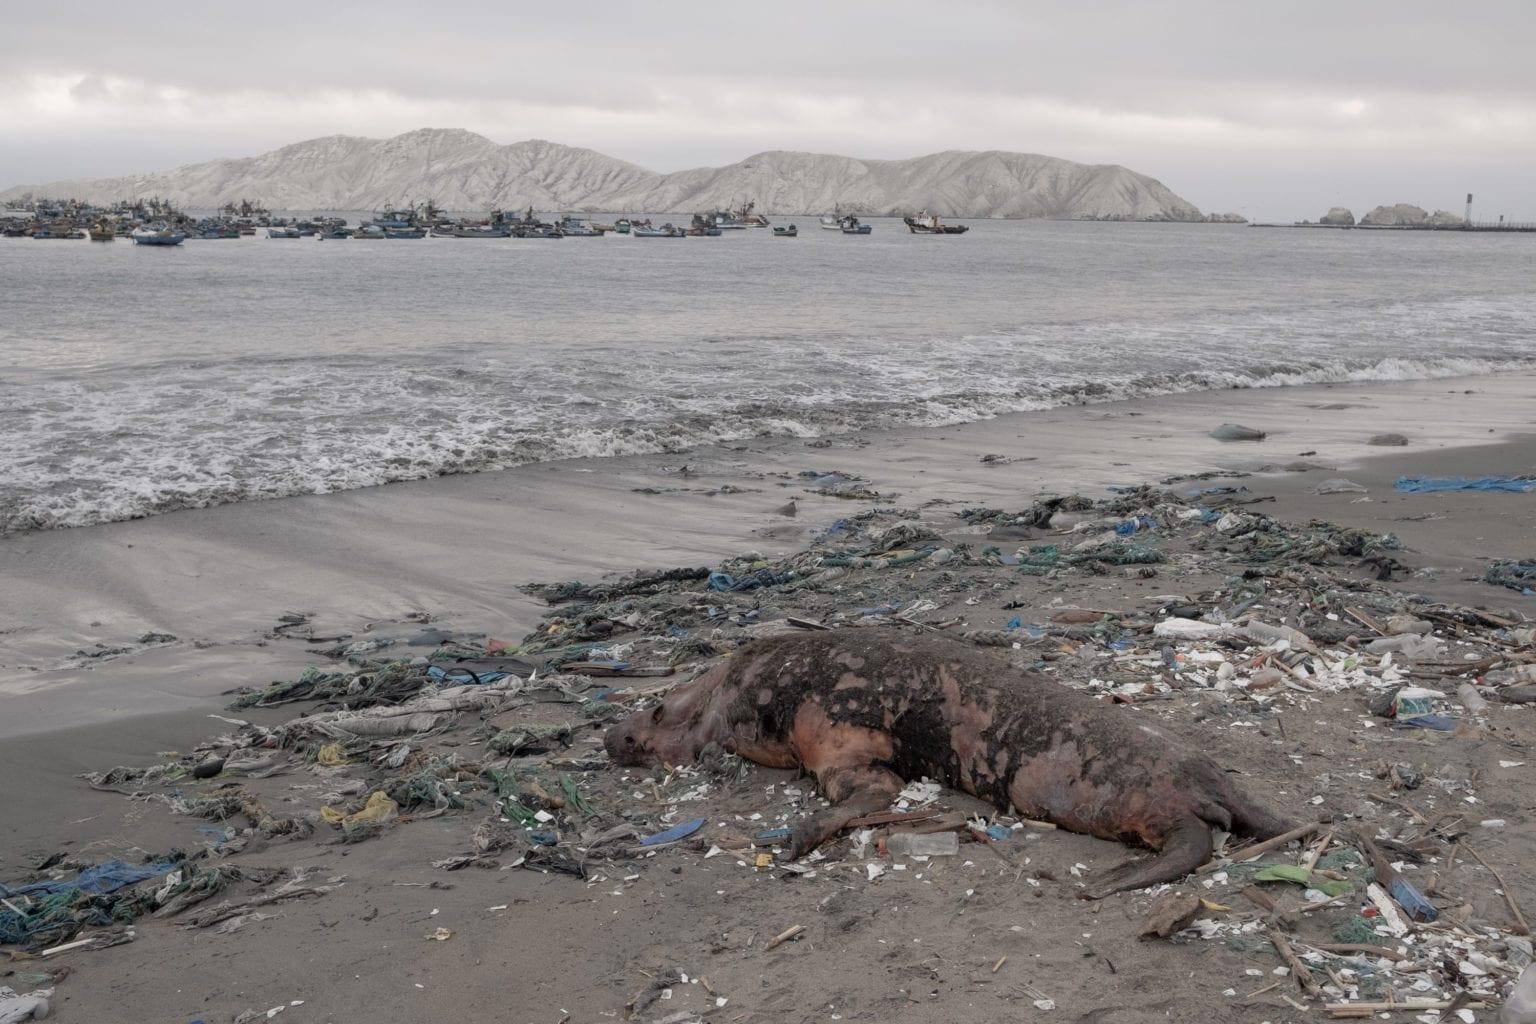 Langs kysten i Chimbote ligger døde søløver i skidtet, der skyller op fra bugten. I baggrunden ligger små industrikuttere, som fanger fisk til fiskemelsfabrikken TASA.